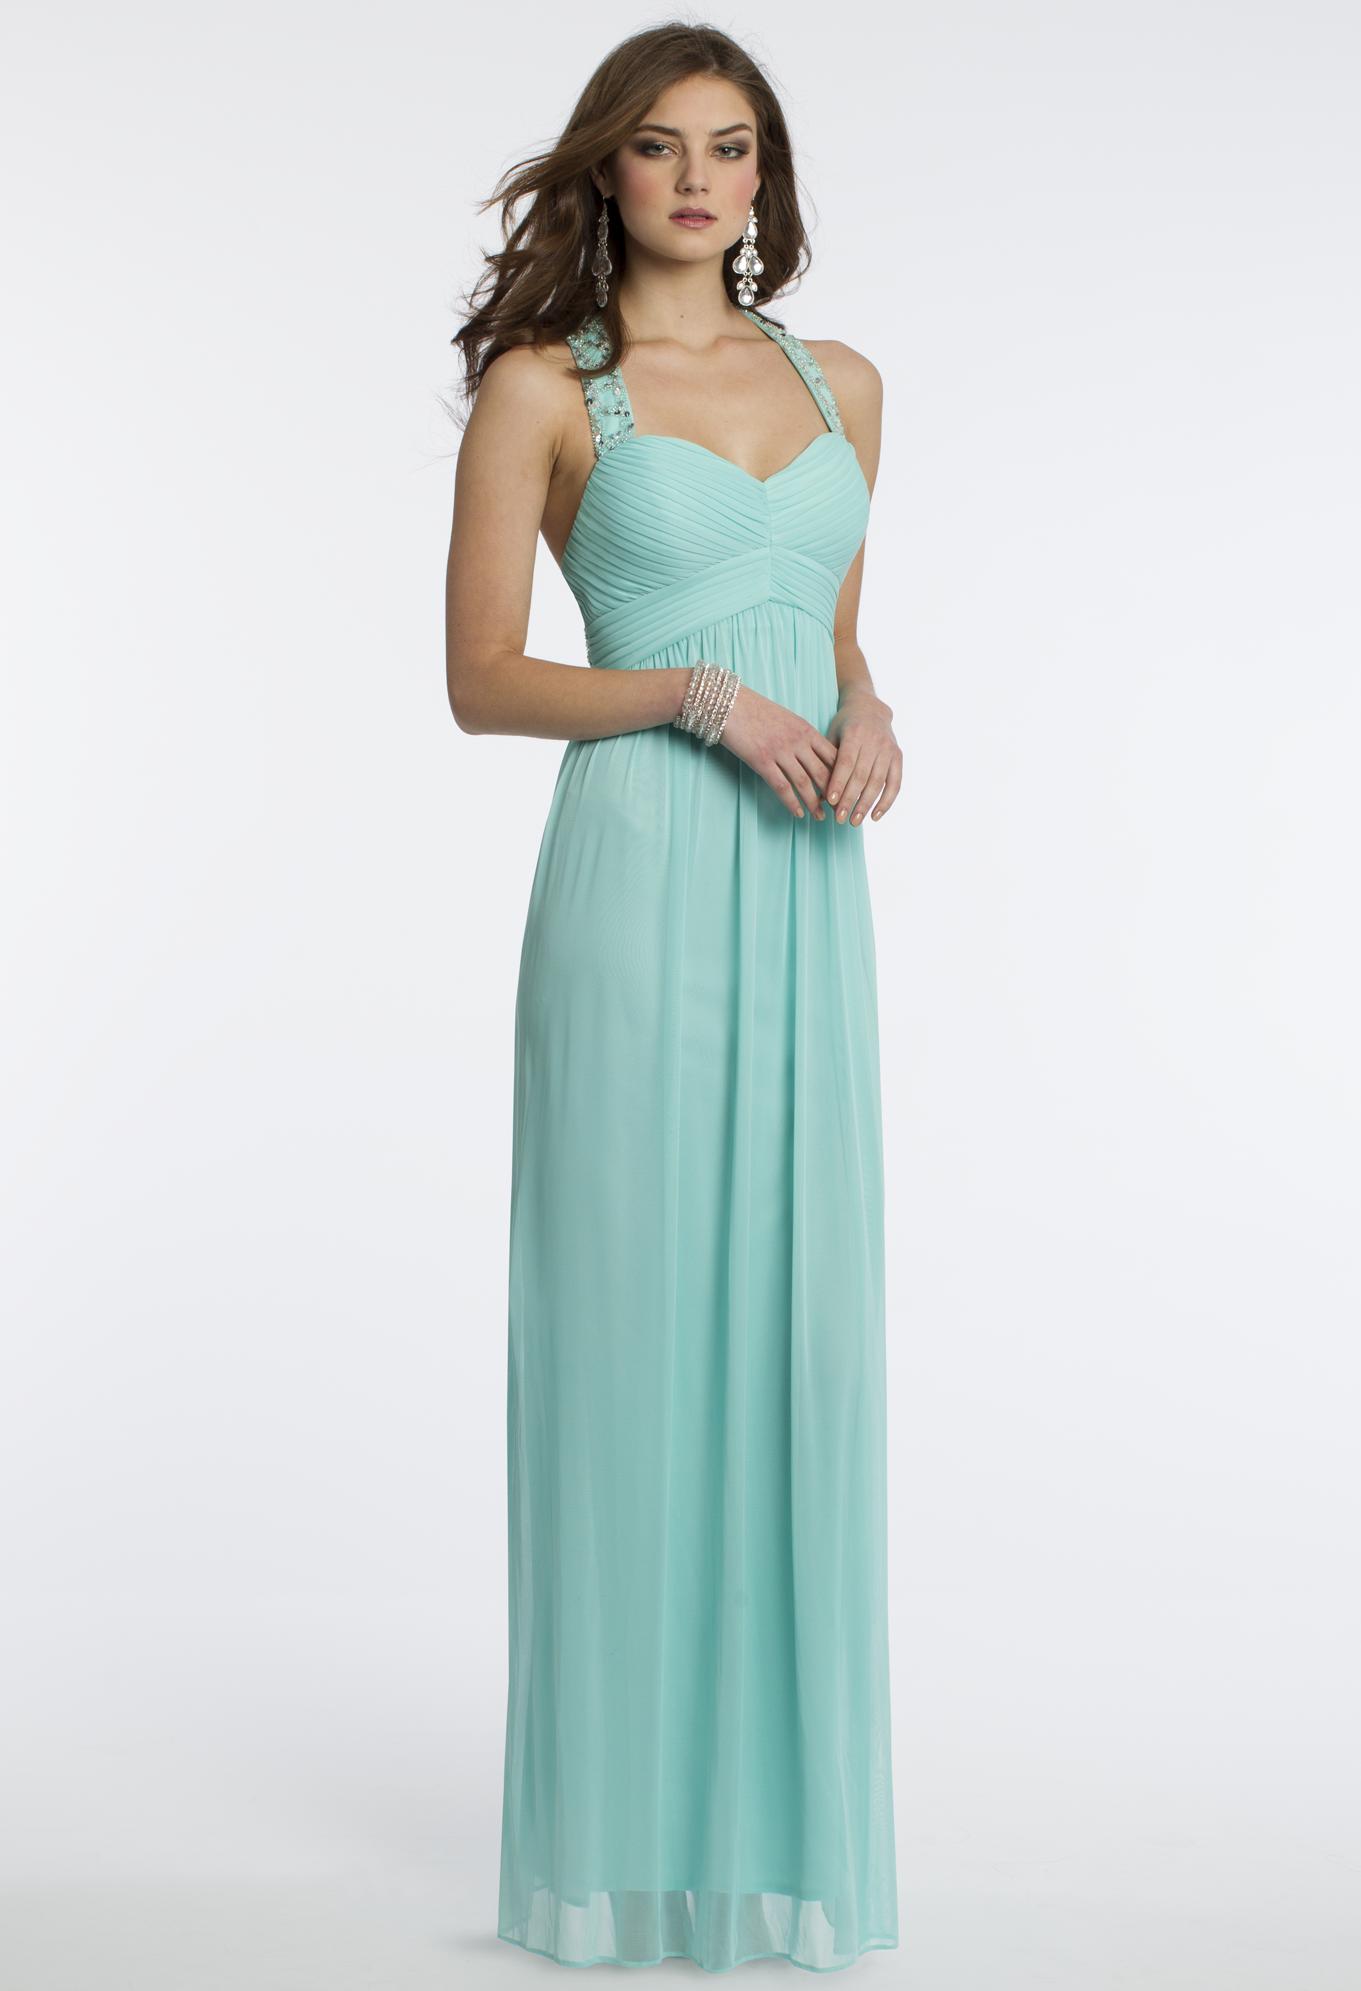 Camille La Vie Mesh Racer Back Prom Dress | PROM DRESSES: LONG ...